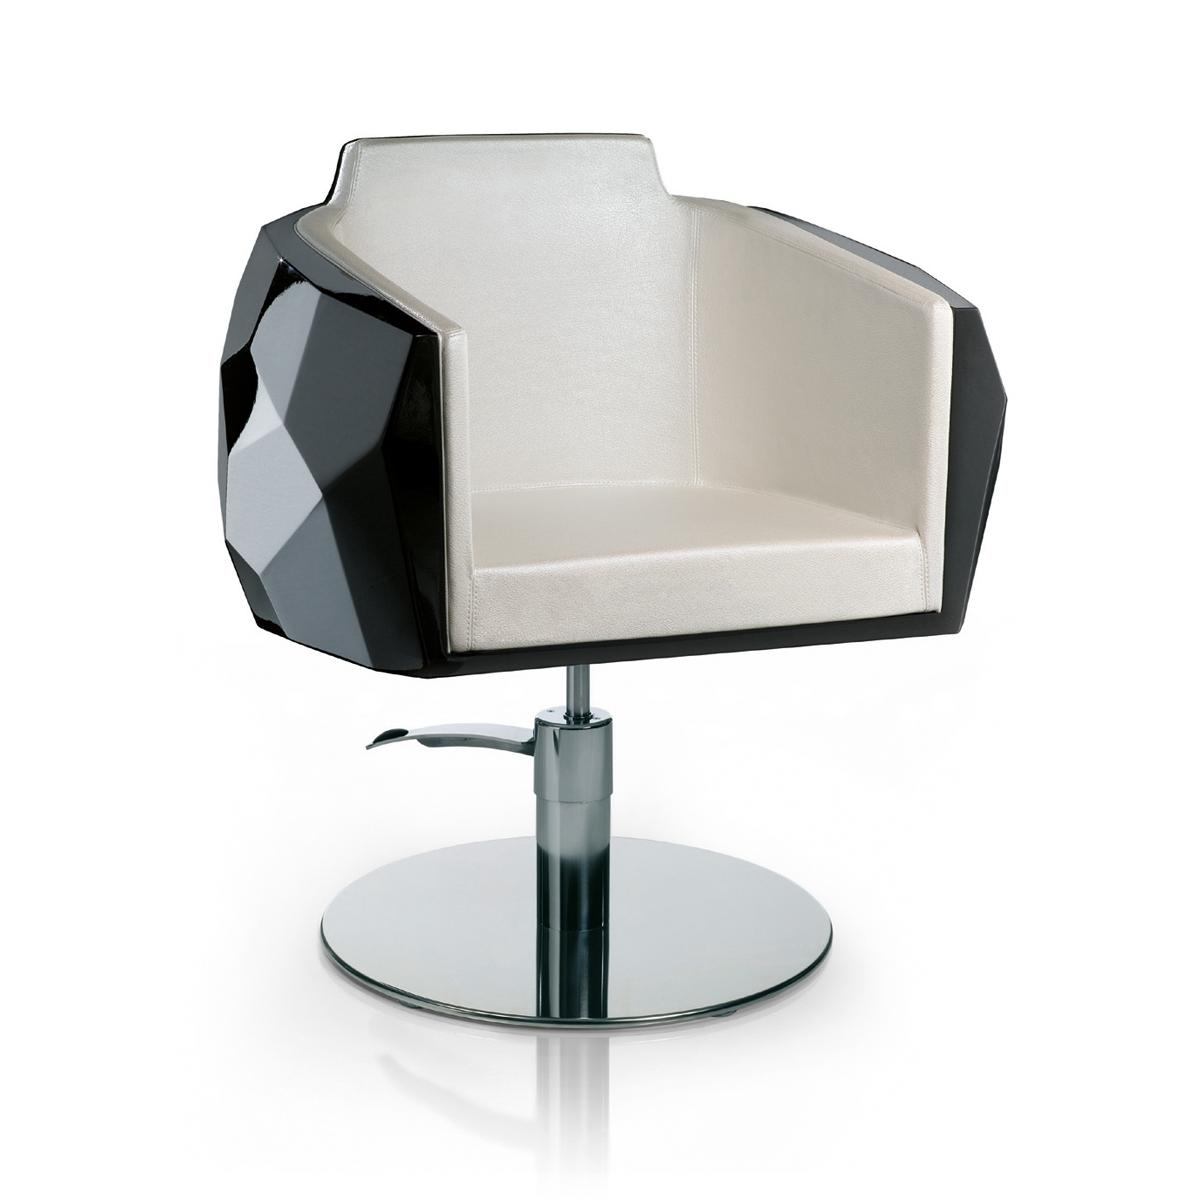 salon furniture materials UNJDQFA